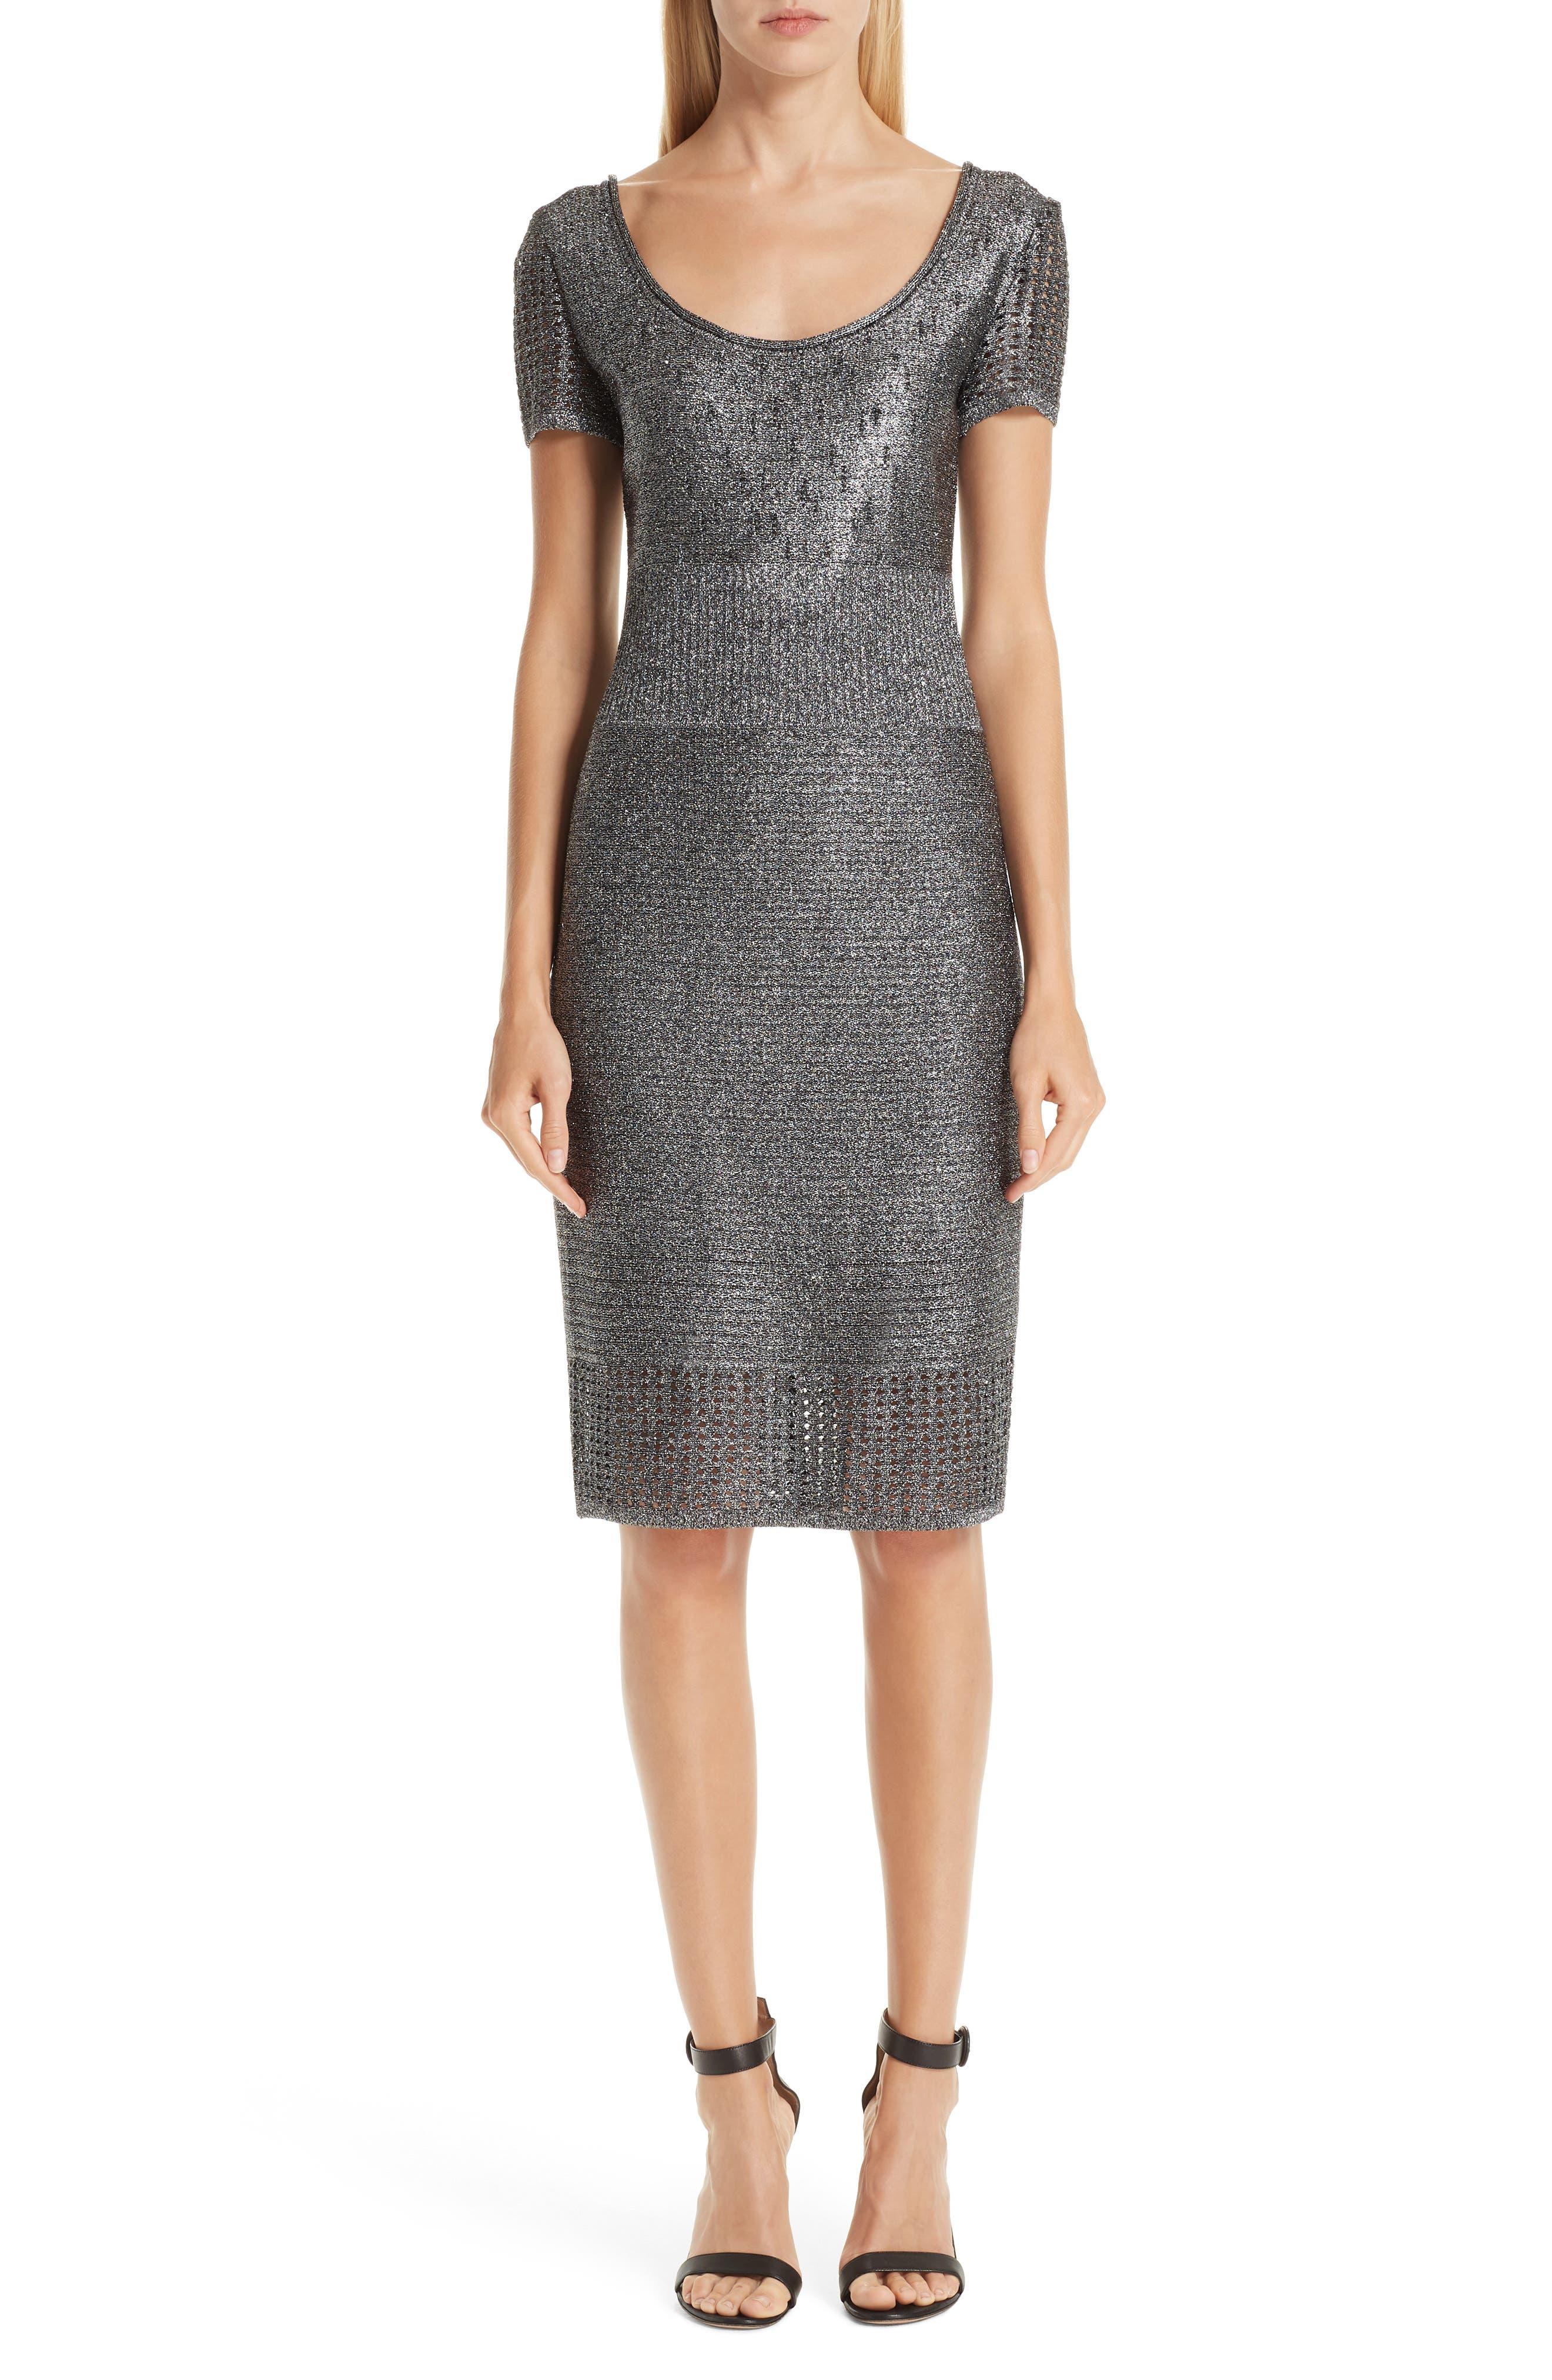 St. John Collection Metallic Plaited Mixed Knit Dress, Black